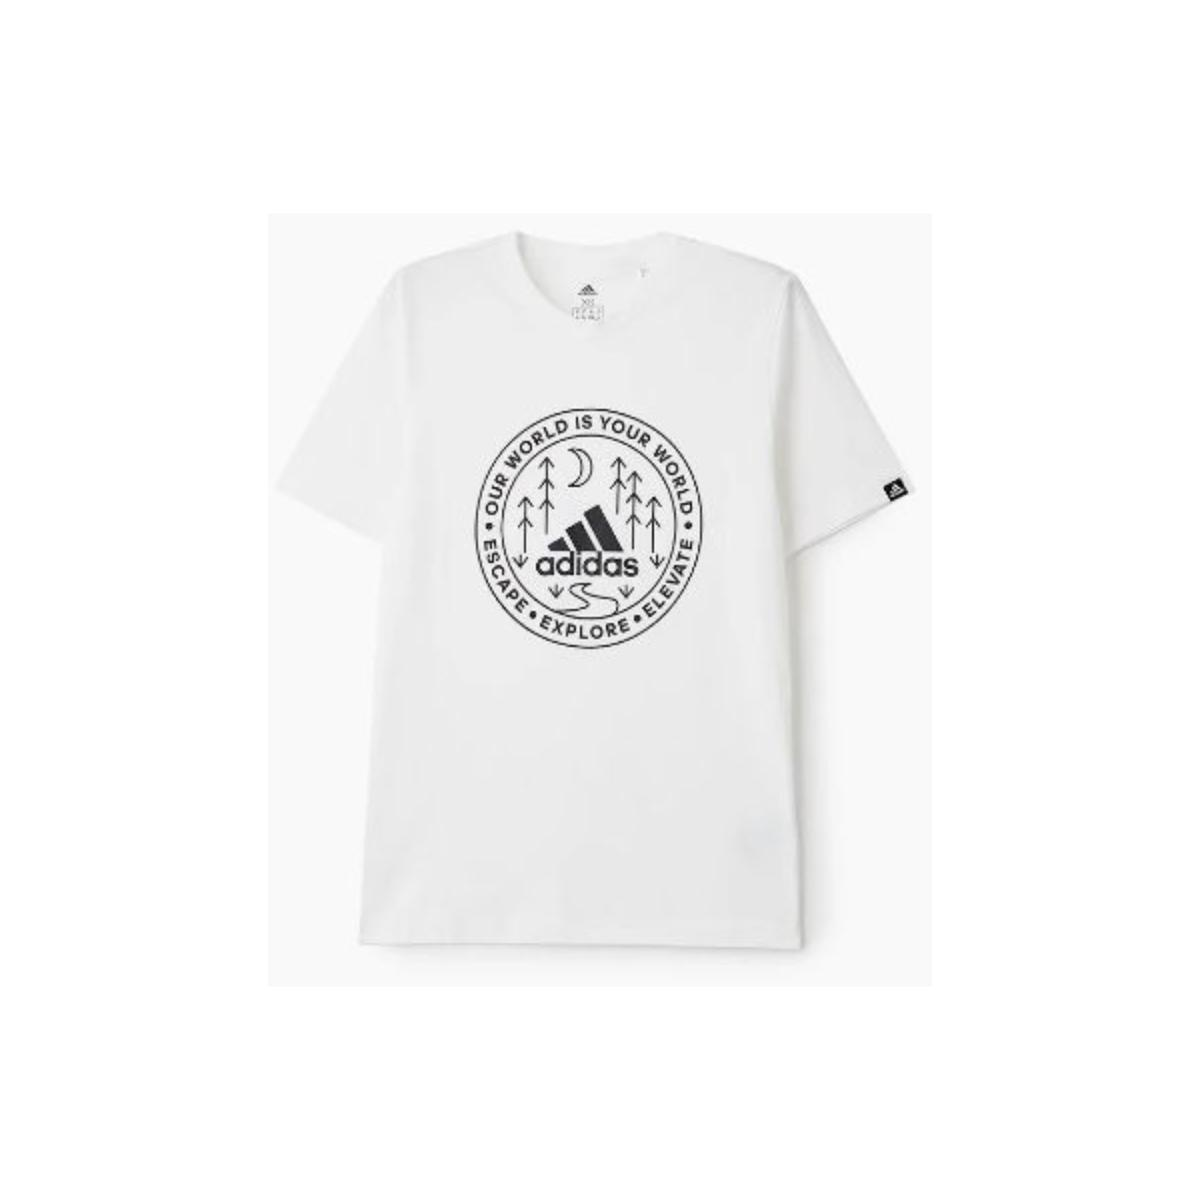 Camiseta Masculina Adidas Gl2690 Grafica Explorer Branco